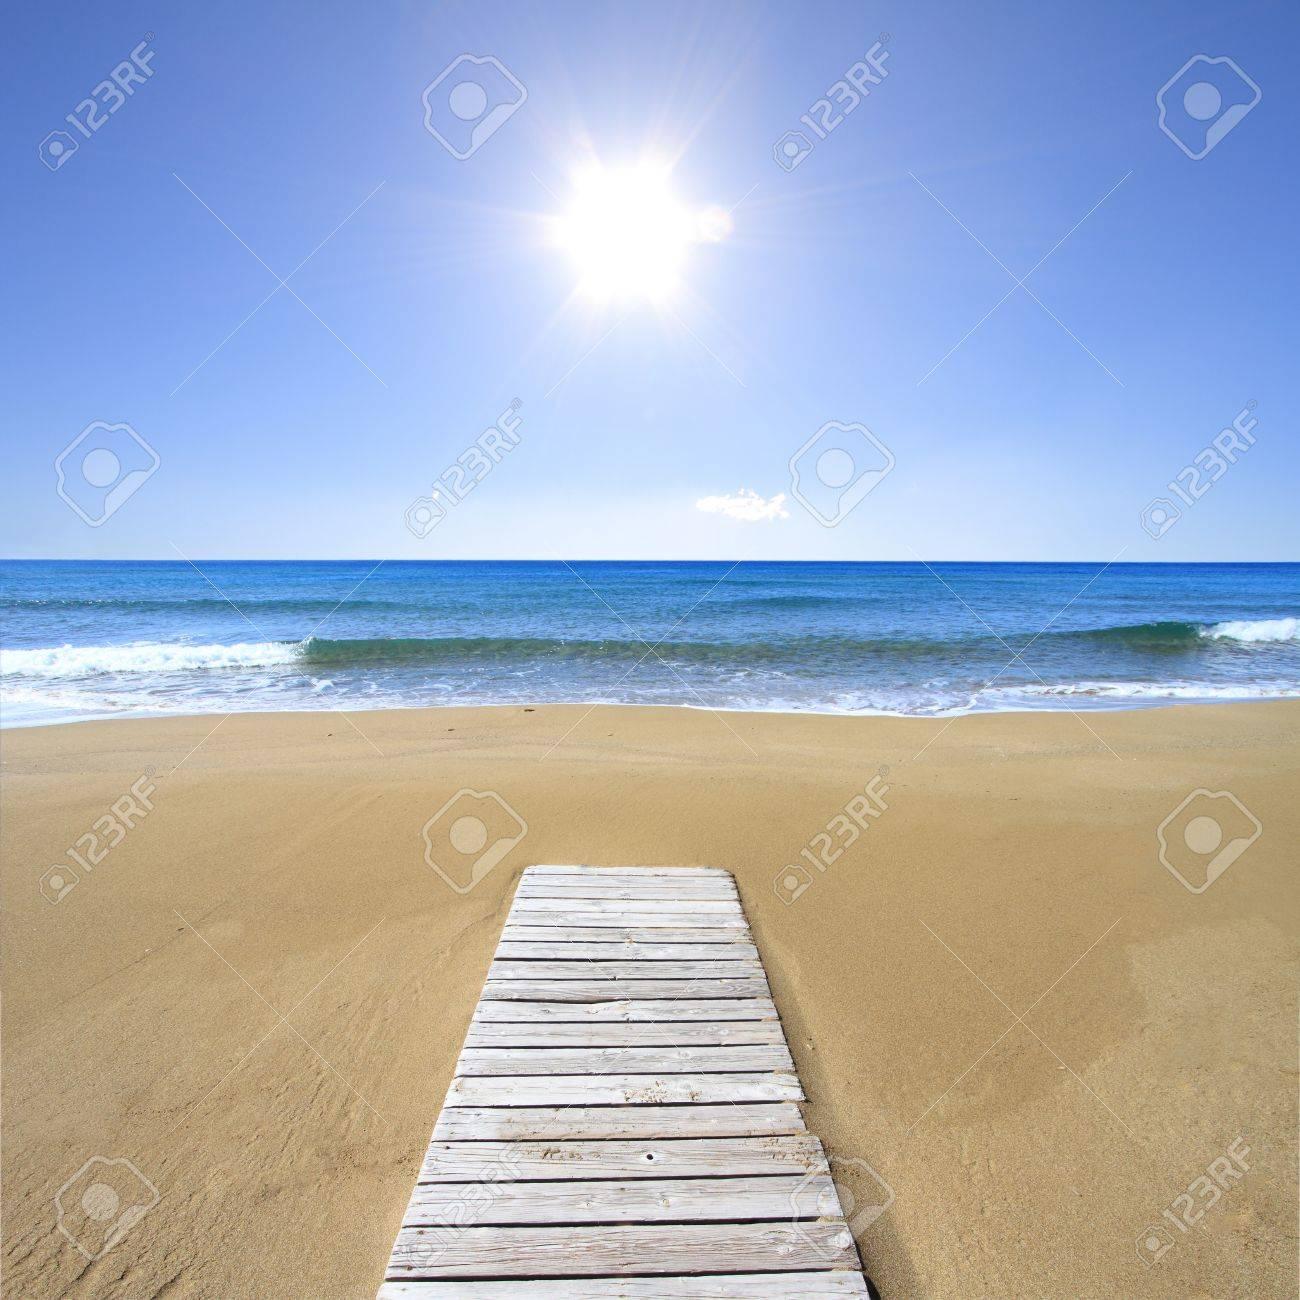 Wooden floor on golden sandy beach Stock Photo - 18866377